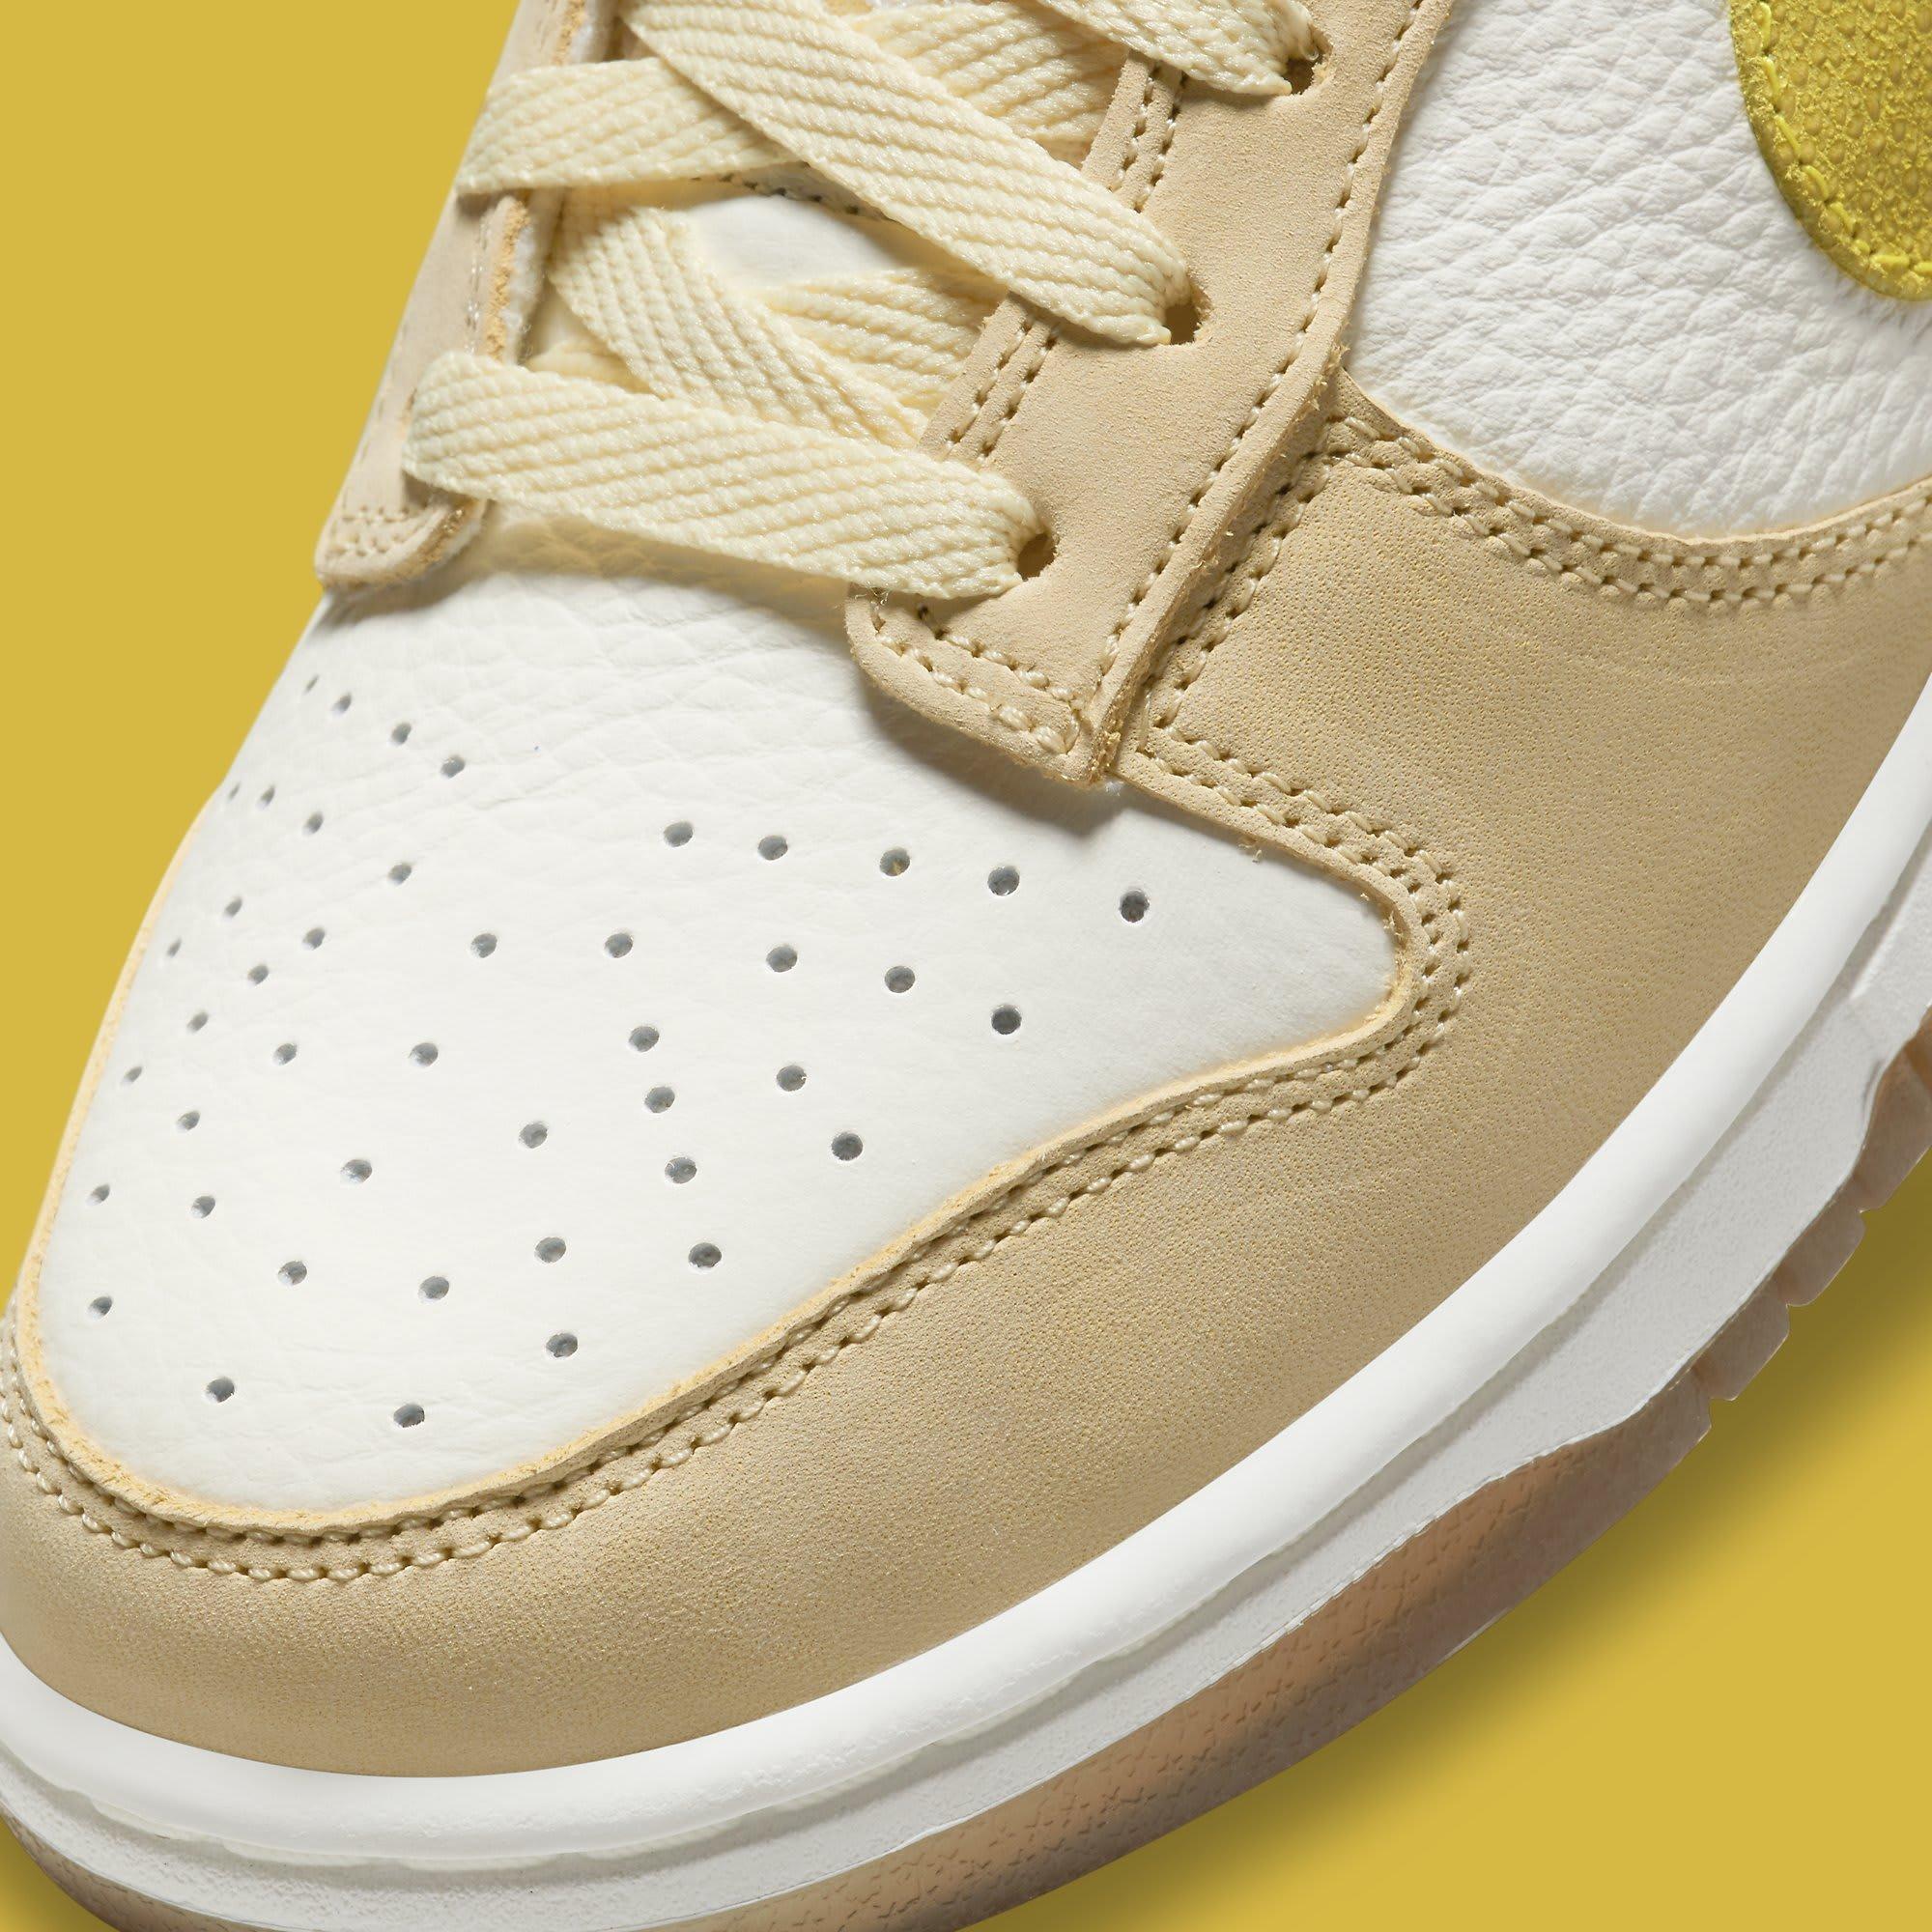 Nike Dunk Low 'Lemon Drop' DJ6902-700 Toe